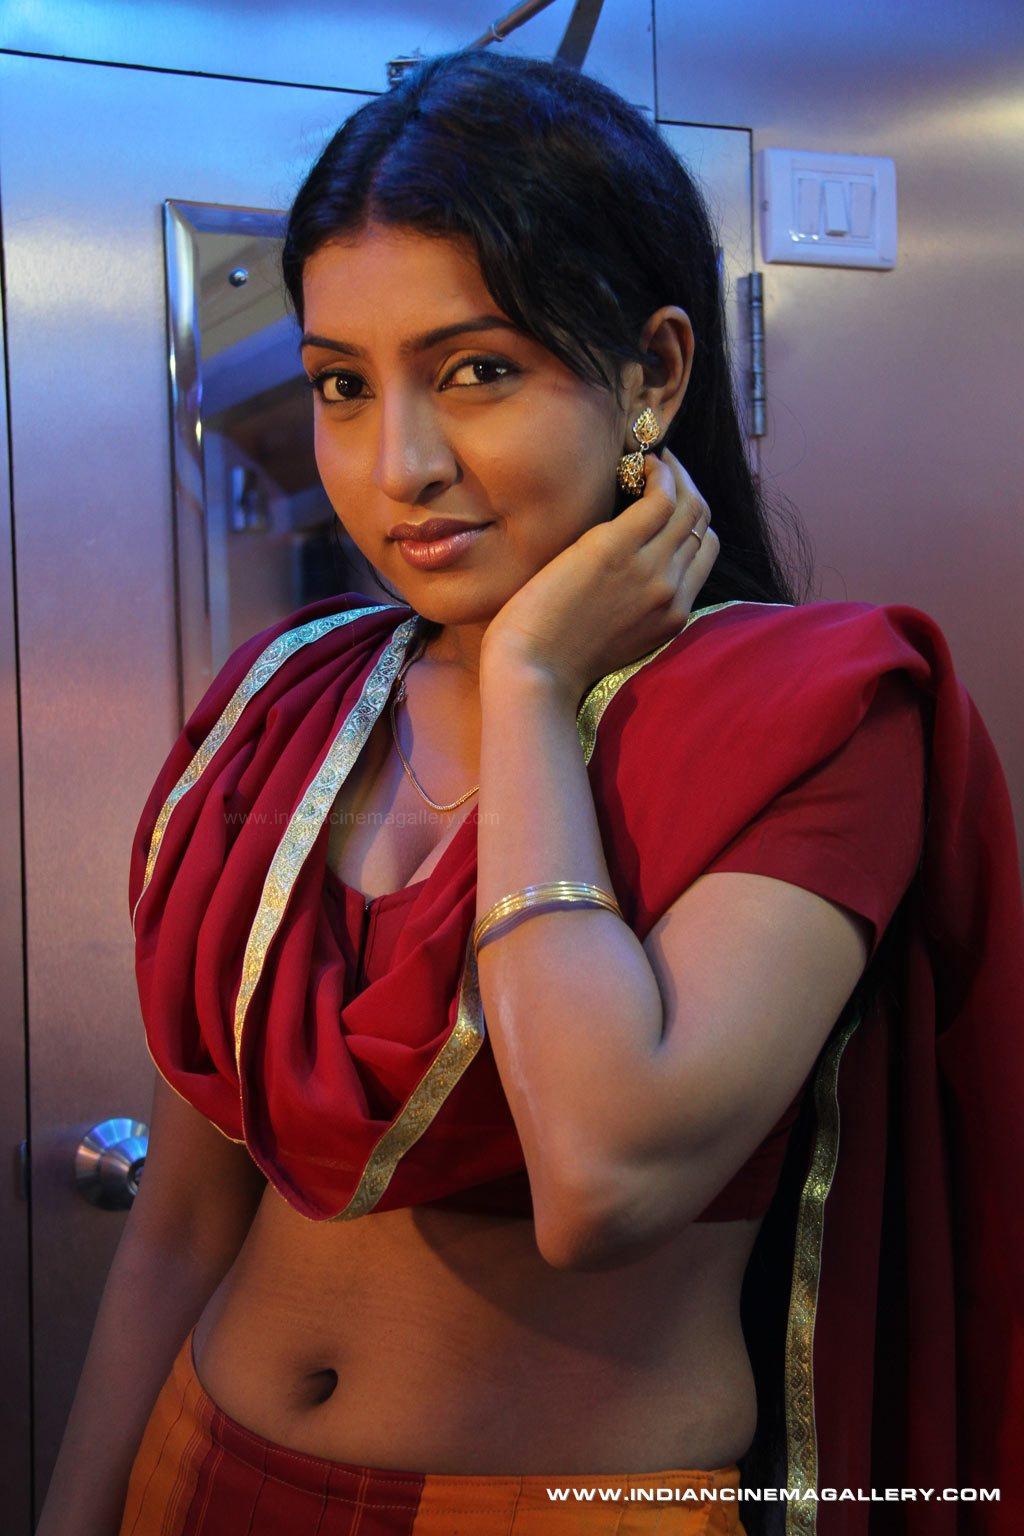 Desi Indian Bhabhi PIctures 3 - Actress